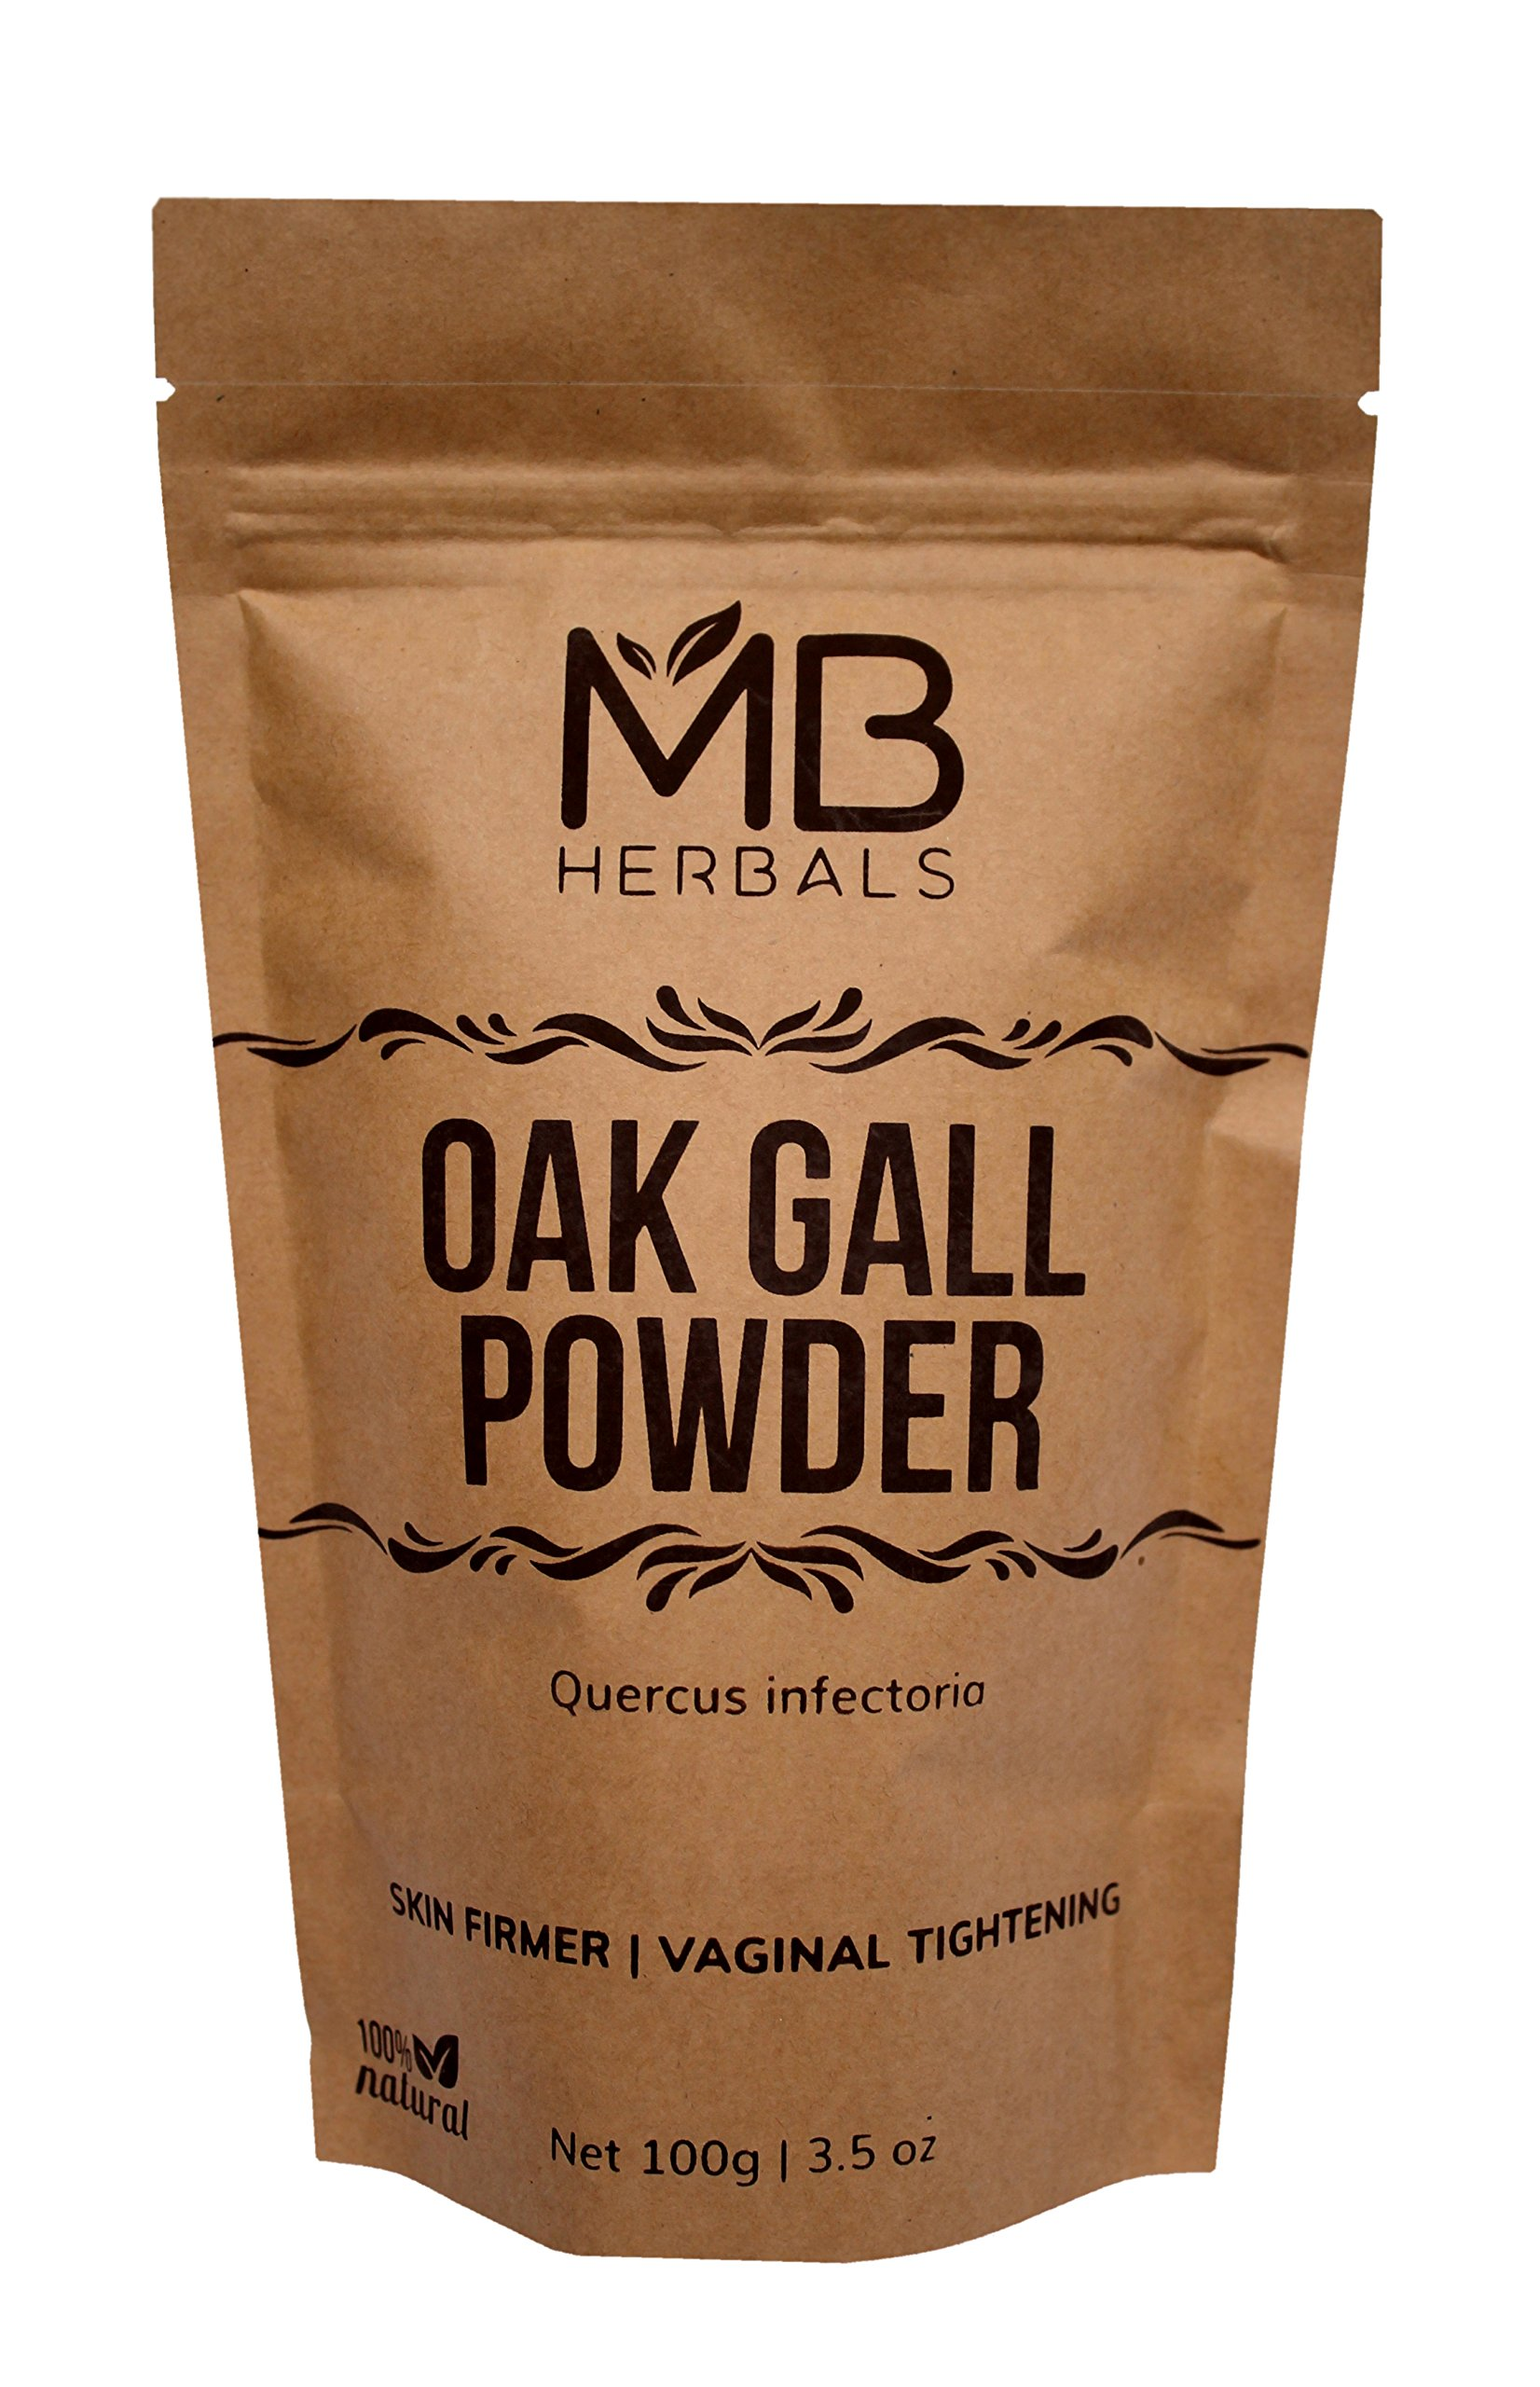 MB Herbals Pure Oak Gall Powder 100g / 3.5 oz - 100% Pure Quercus Infectoria / Majuphal / Manjakani - May help in Vaginal Tightening & Bleeding Gums